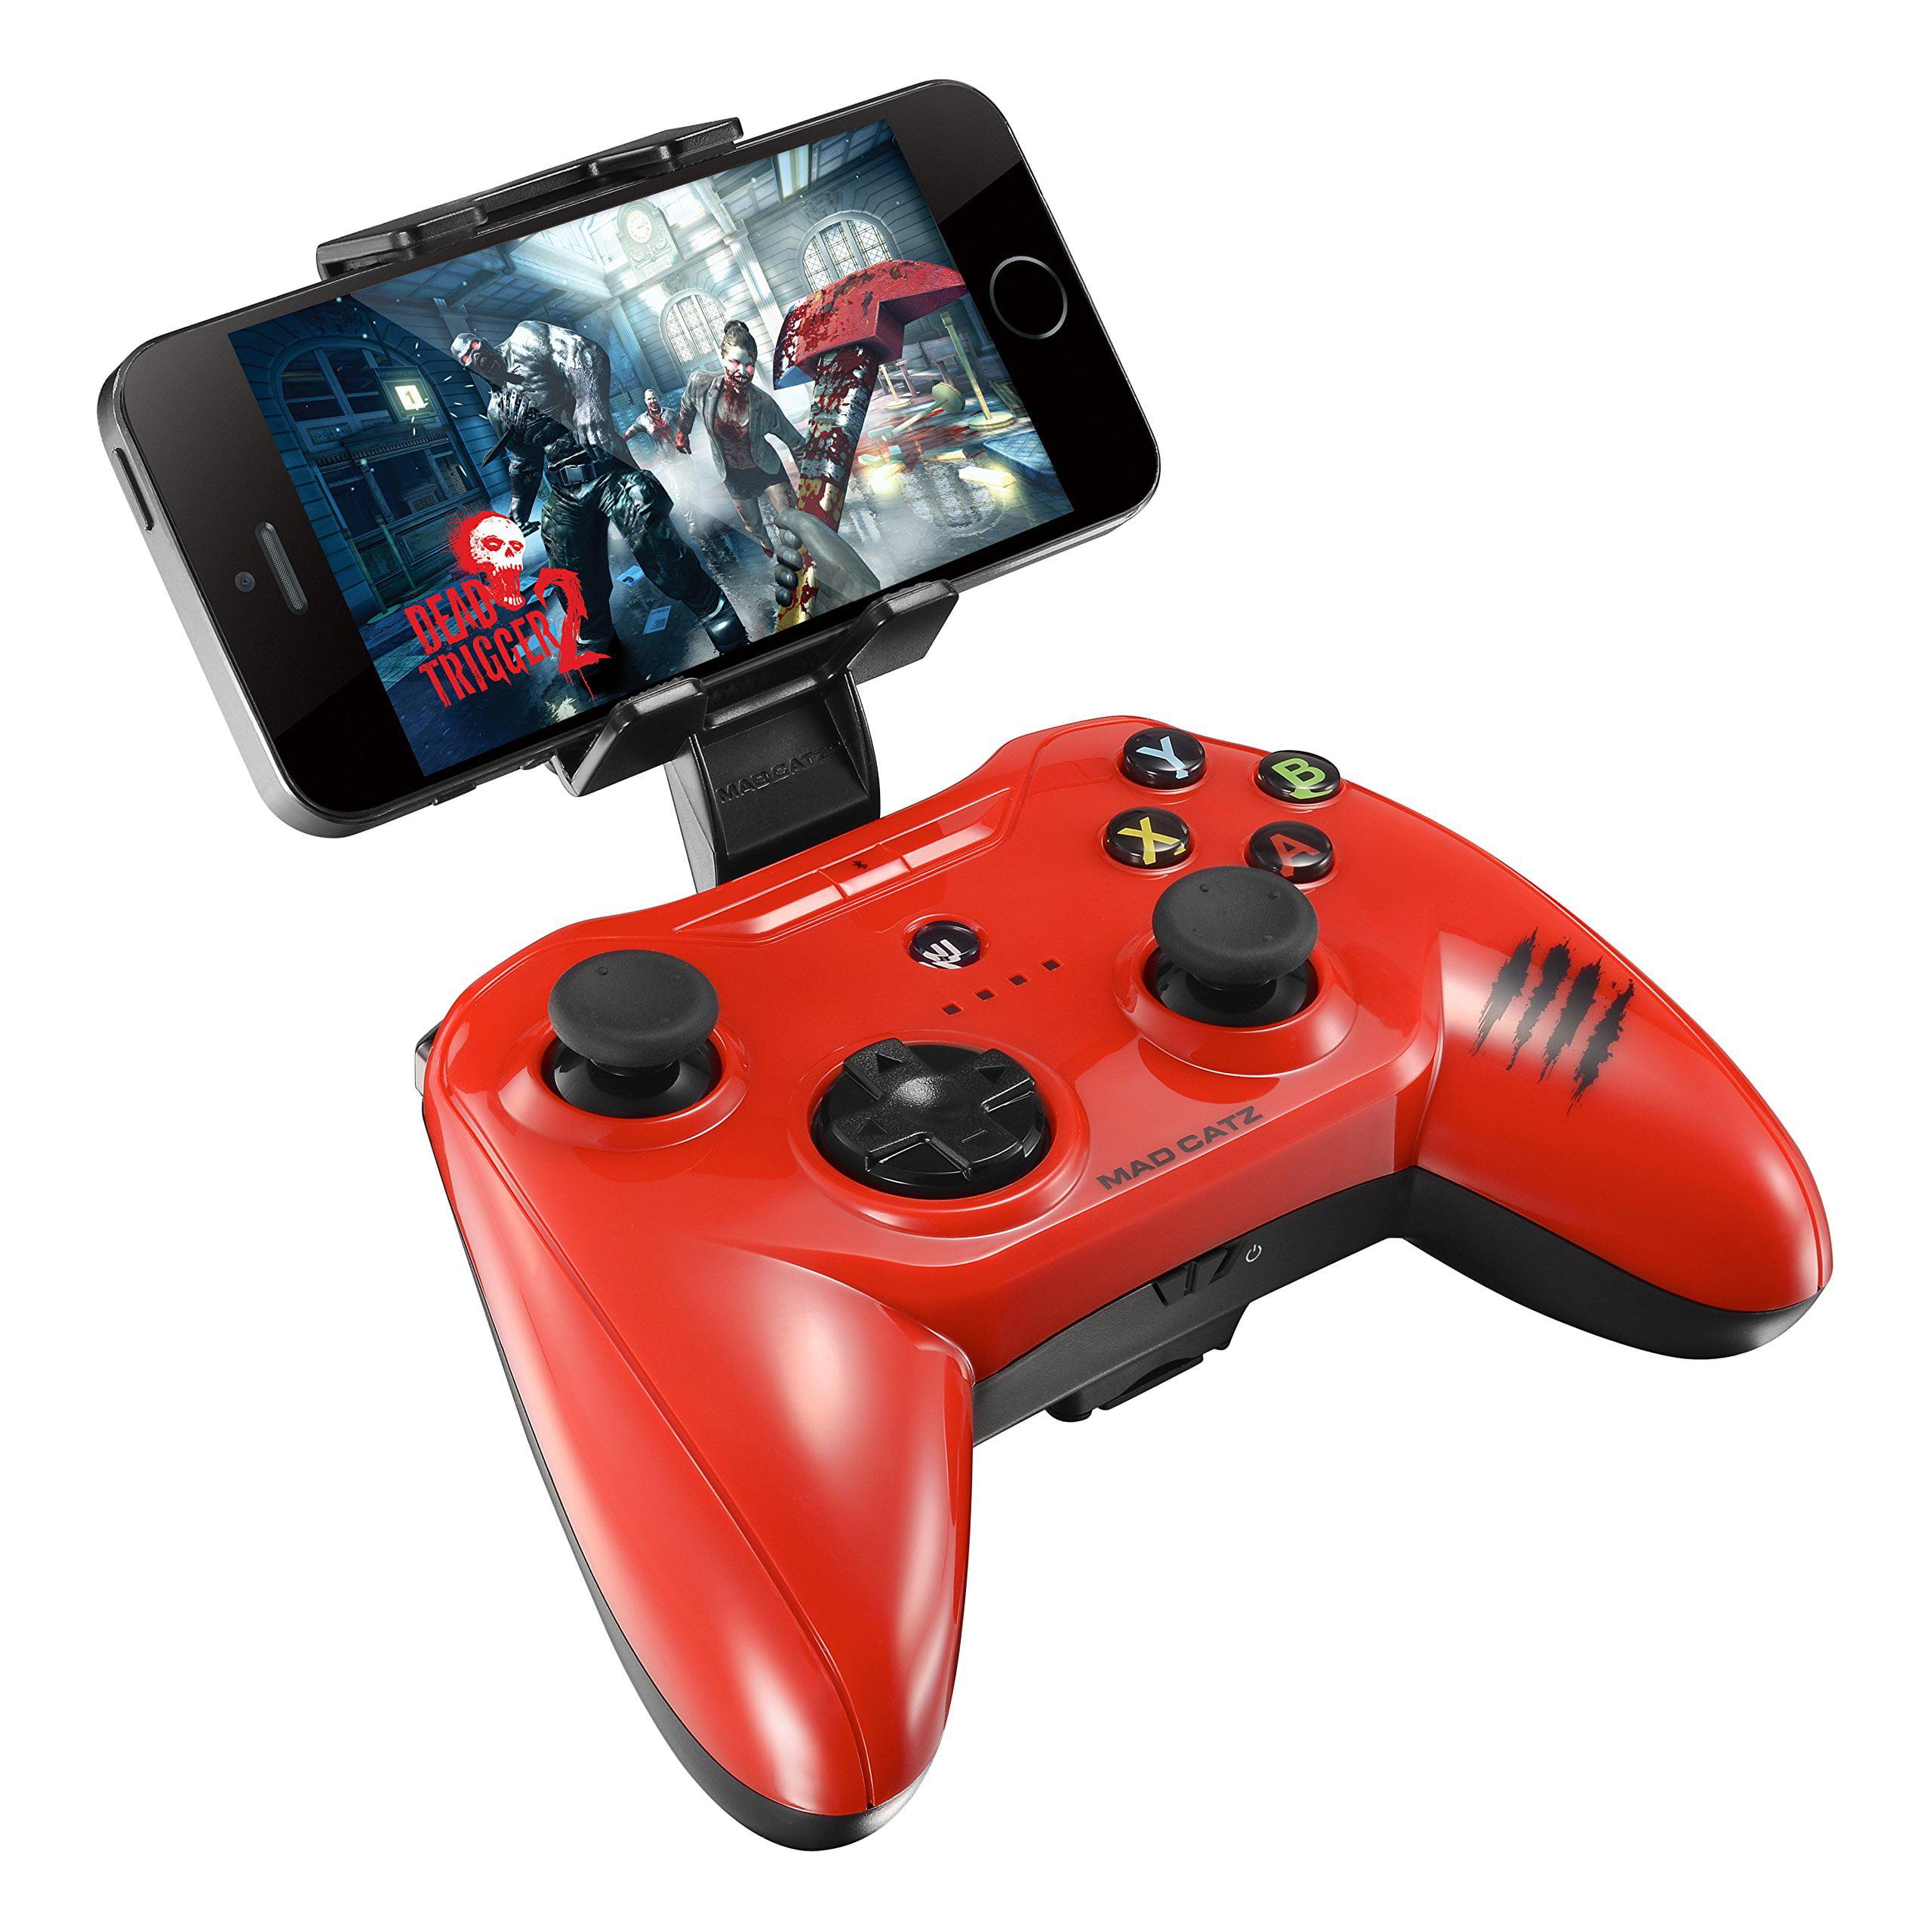 Saitek C.t.r.l.i Mobile Gamepad For Apple Ipod, Iphone, And Ipad Wireless Bluetoothiphone, Ipad, Ipad Mini, Ipad Air,... by Saitek